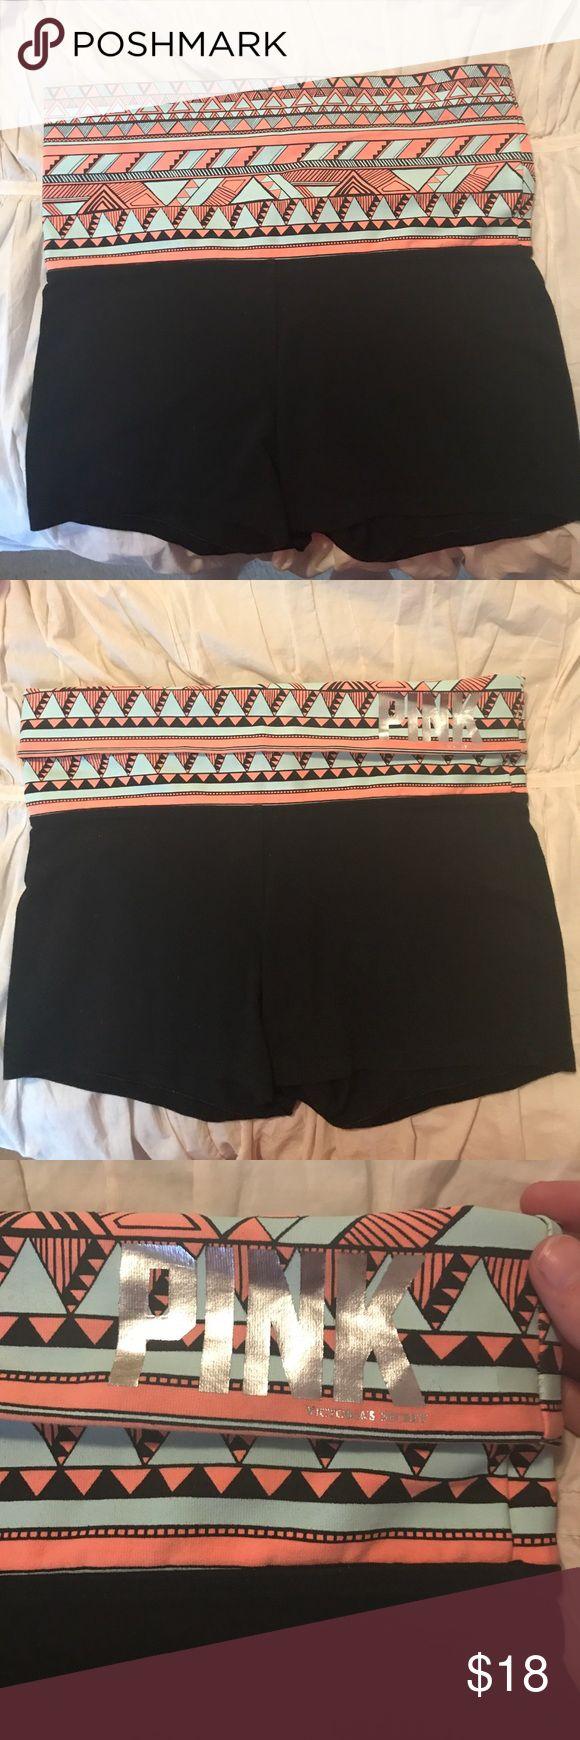 Victoria's Secret Fold over Yoga Pants VS Fold-over Yoga Pants! Pet free/Smoke free home! Only worn a few times-excellent condition! PINK Victoria's Secret Shorts